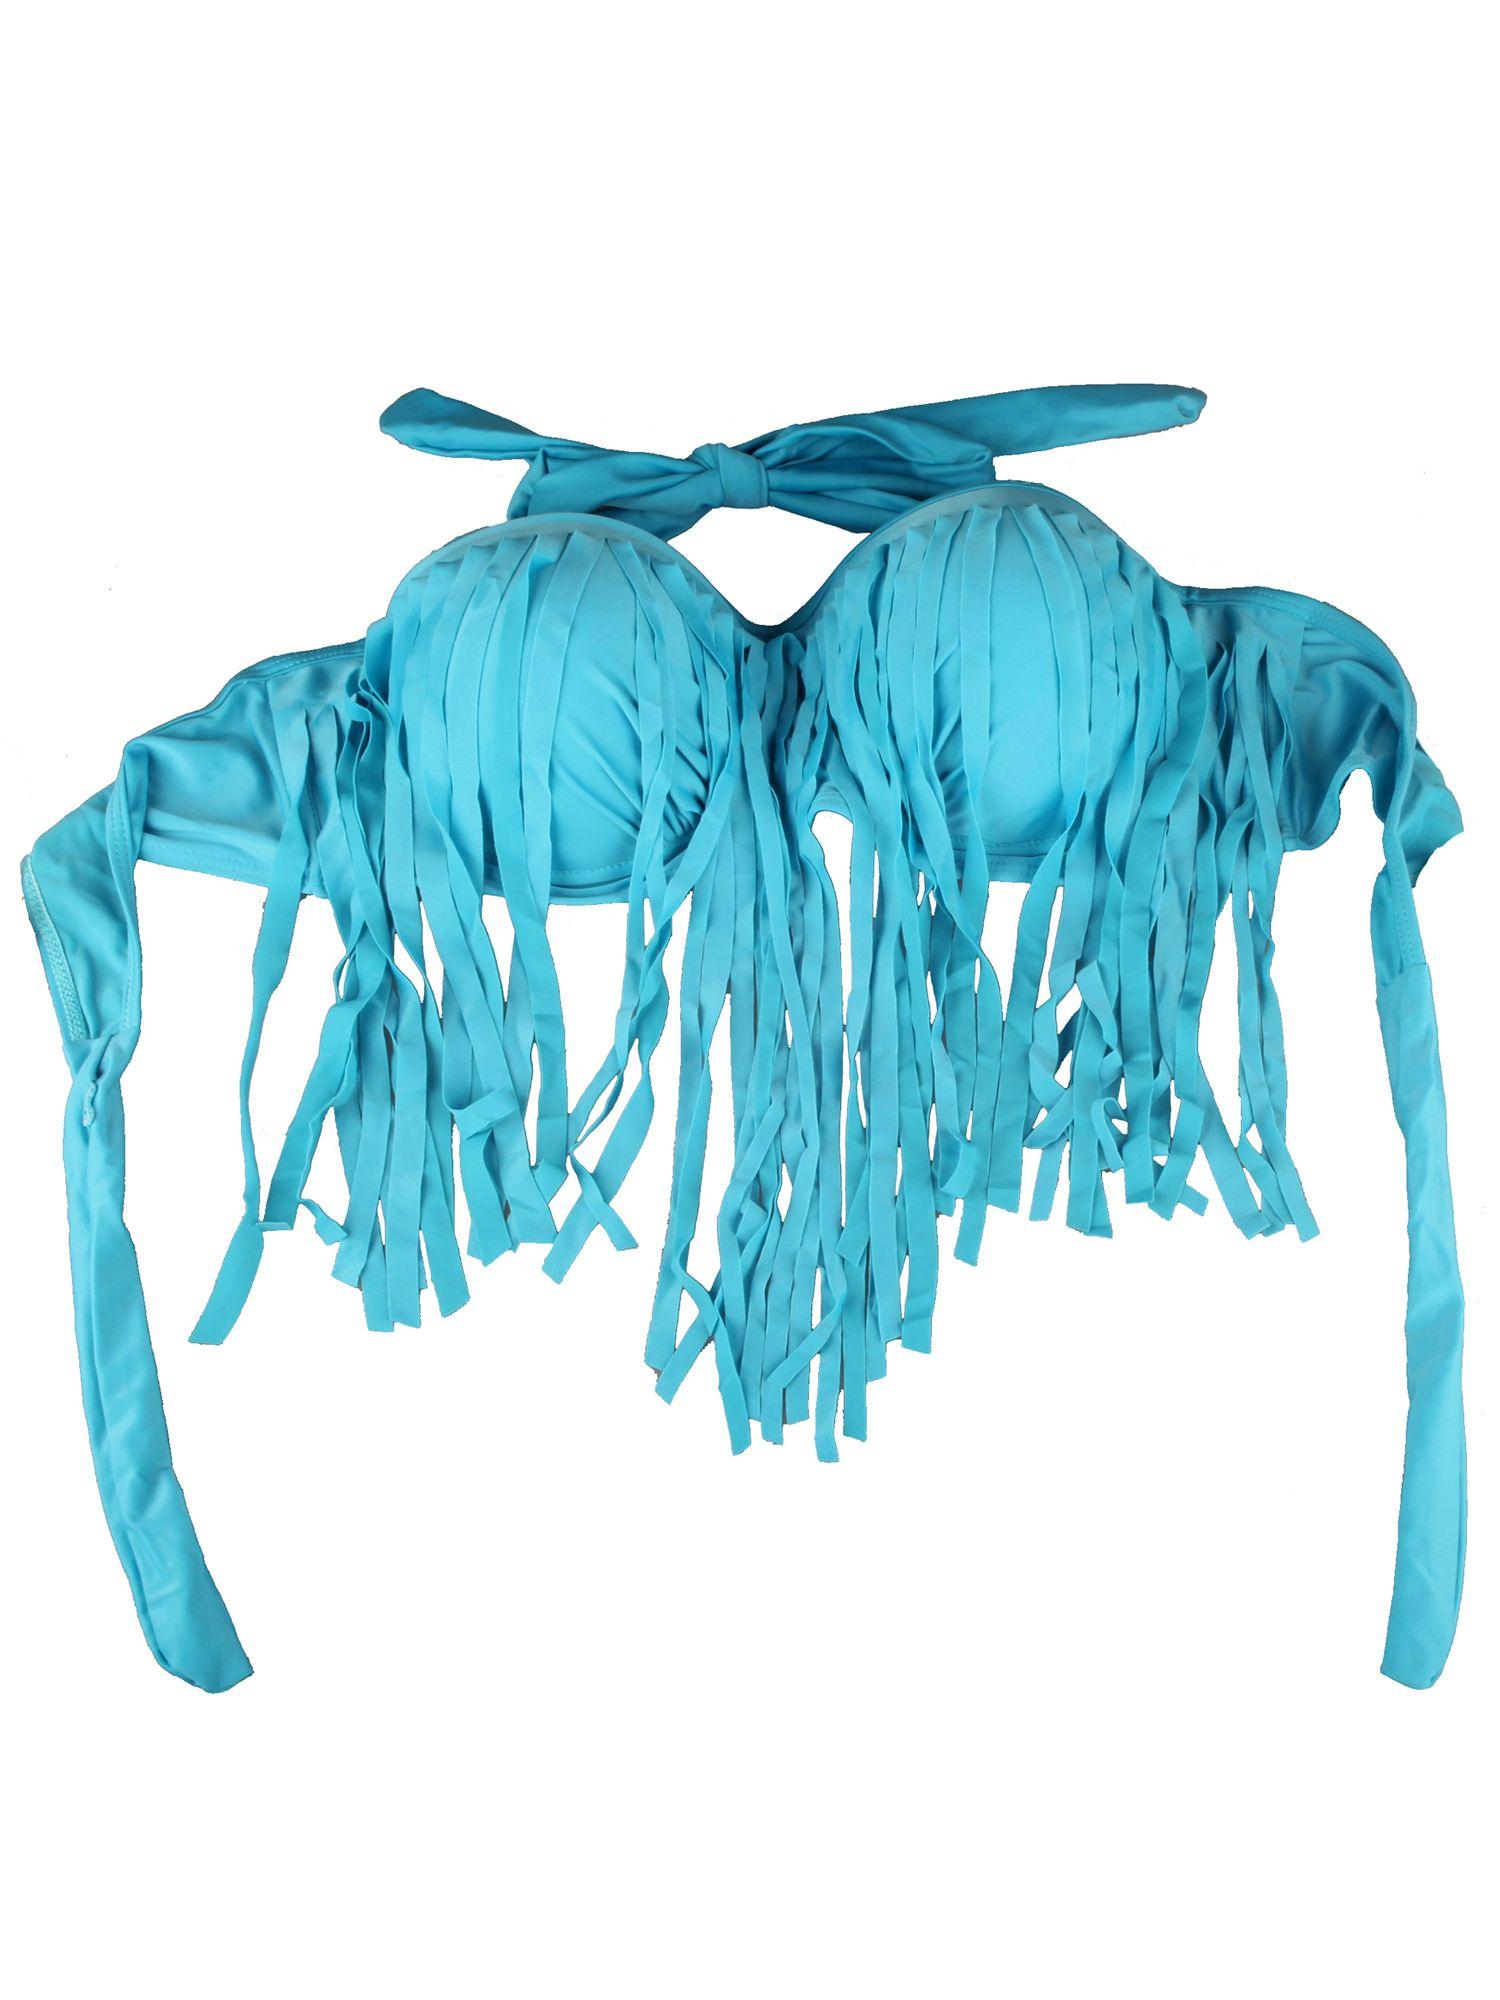 e0bd50768935b LELINTA Women s Two Piece Braided Fringe Top High Waist Bottoms Bikini Set Swimwear  Plus Size Swimsuit